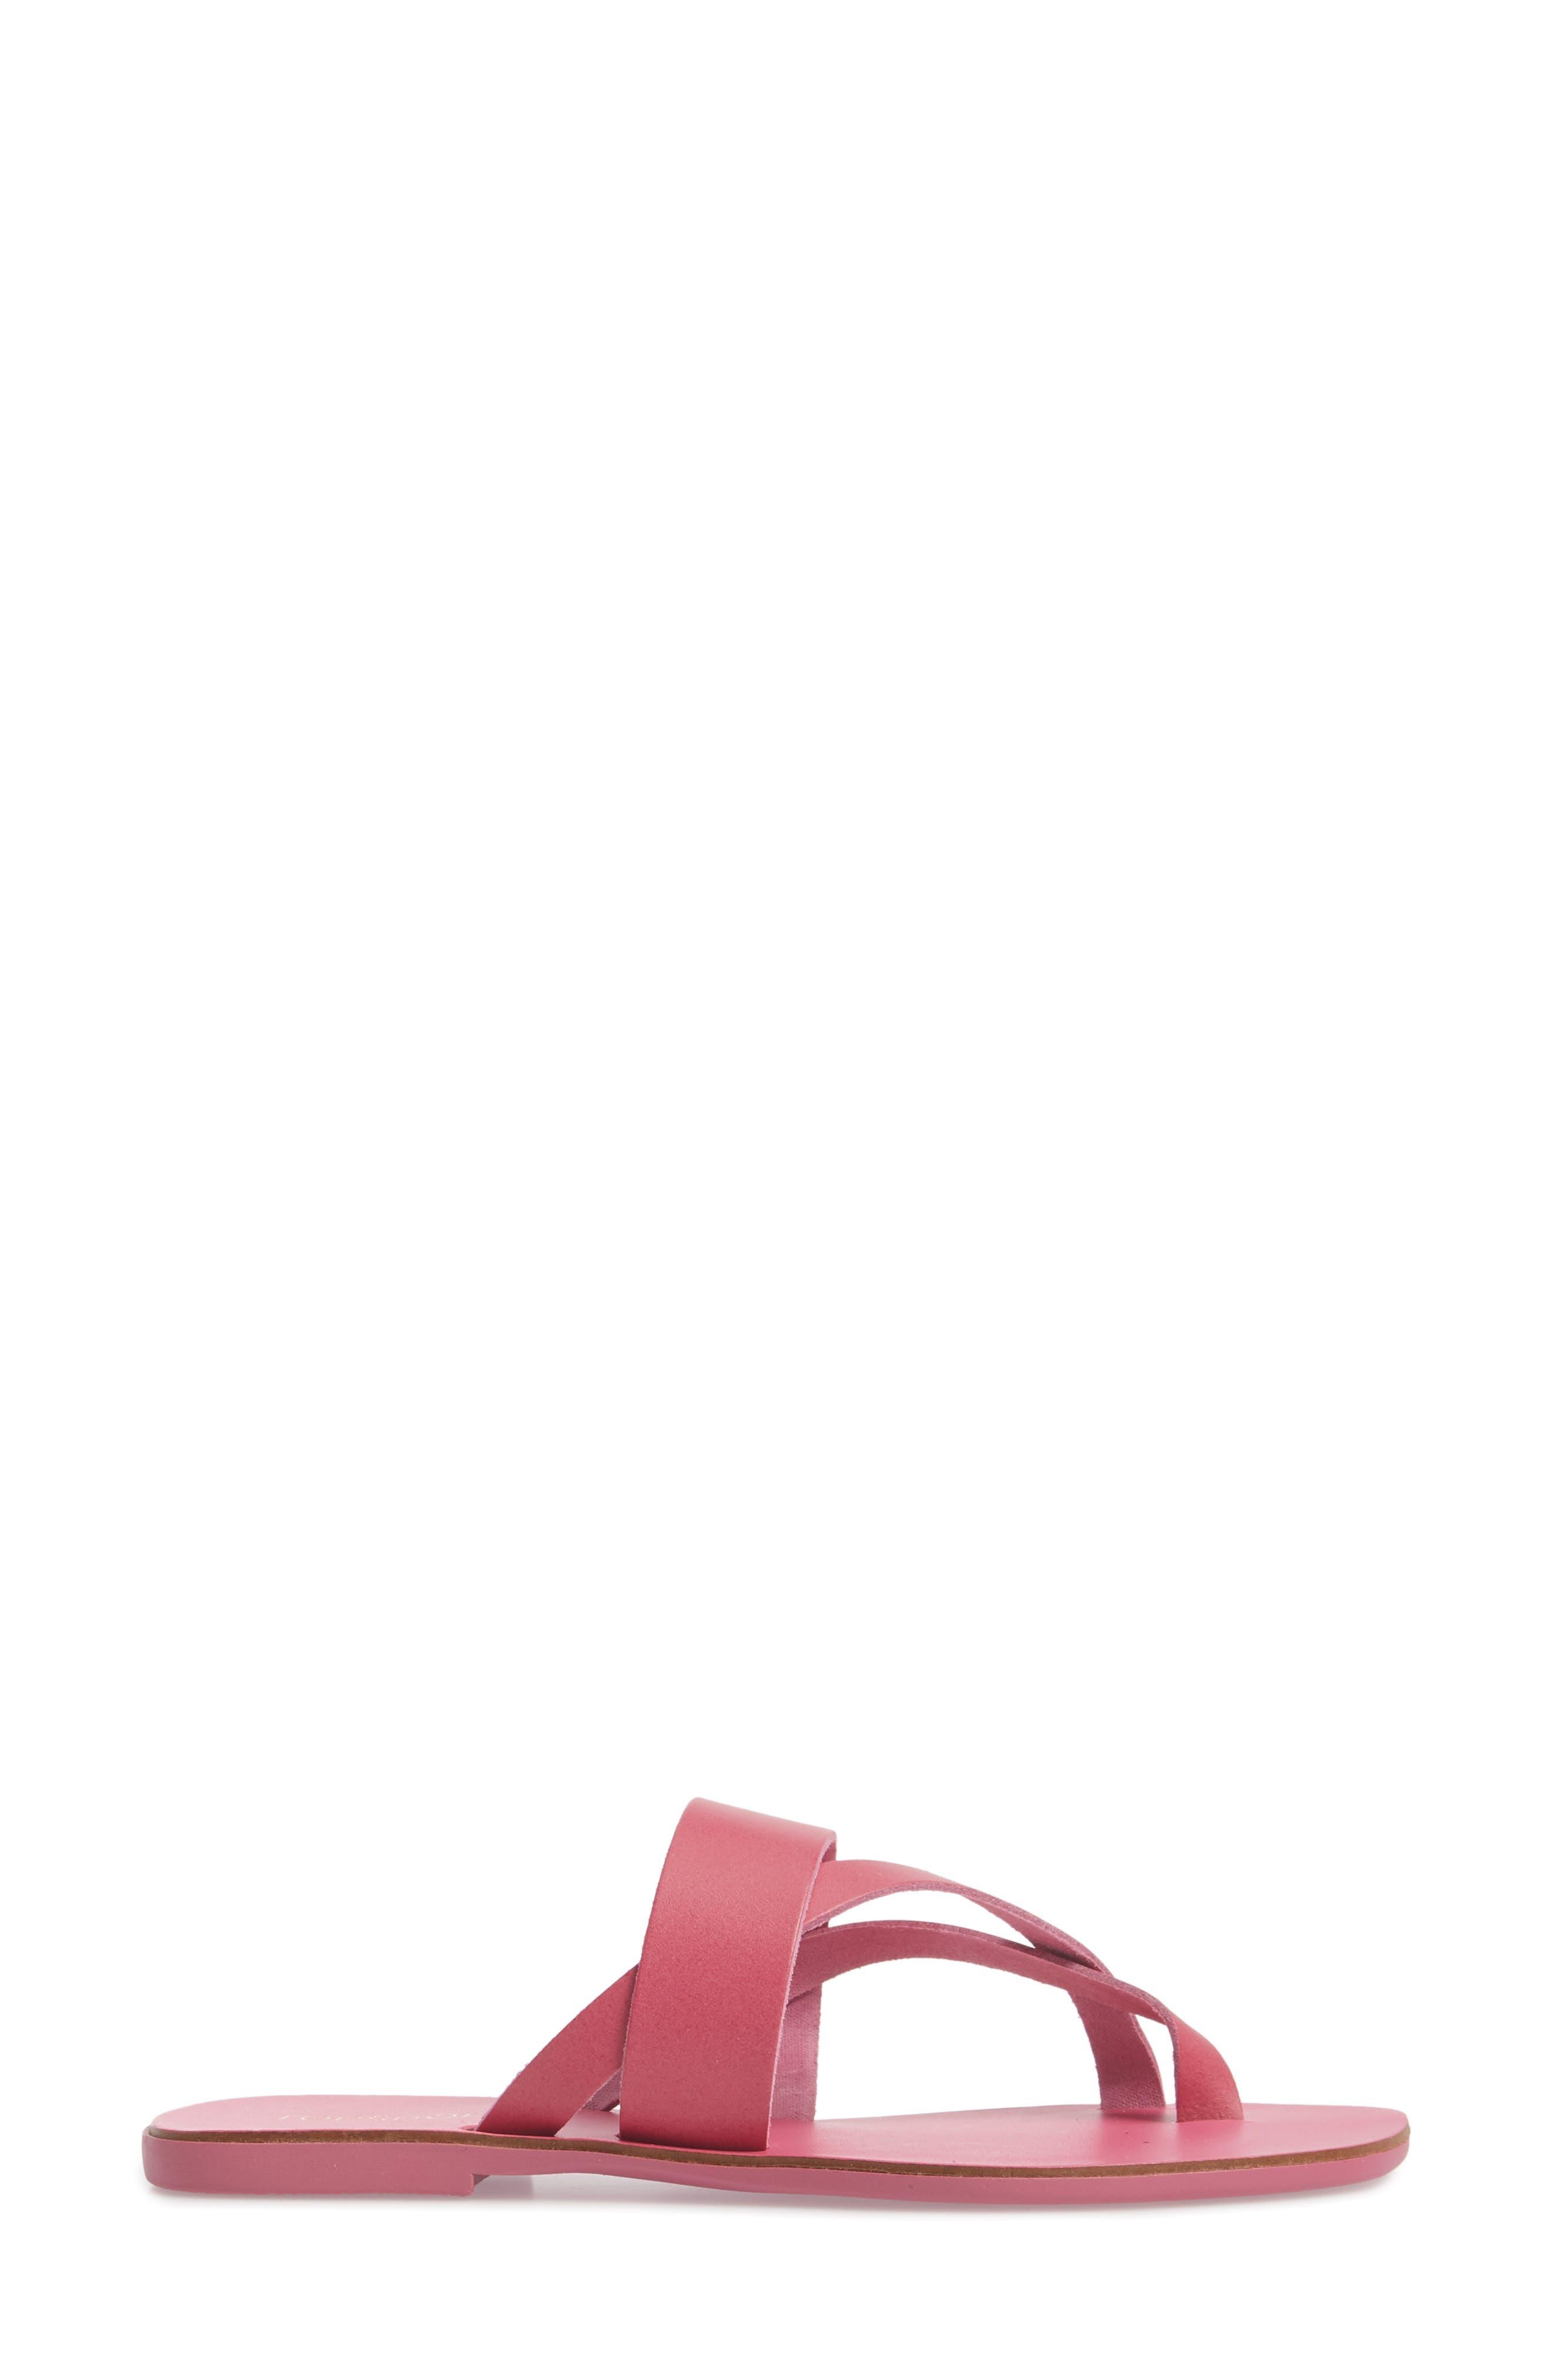 Harper Sandal,                             Alternate thumbnail 3, color,                             Pink